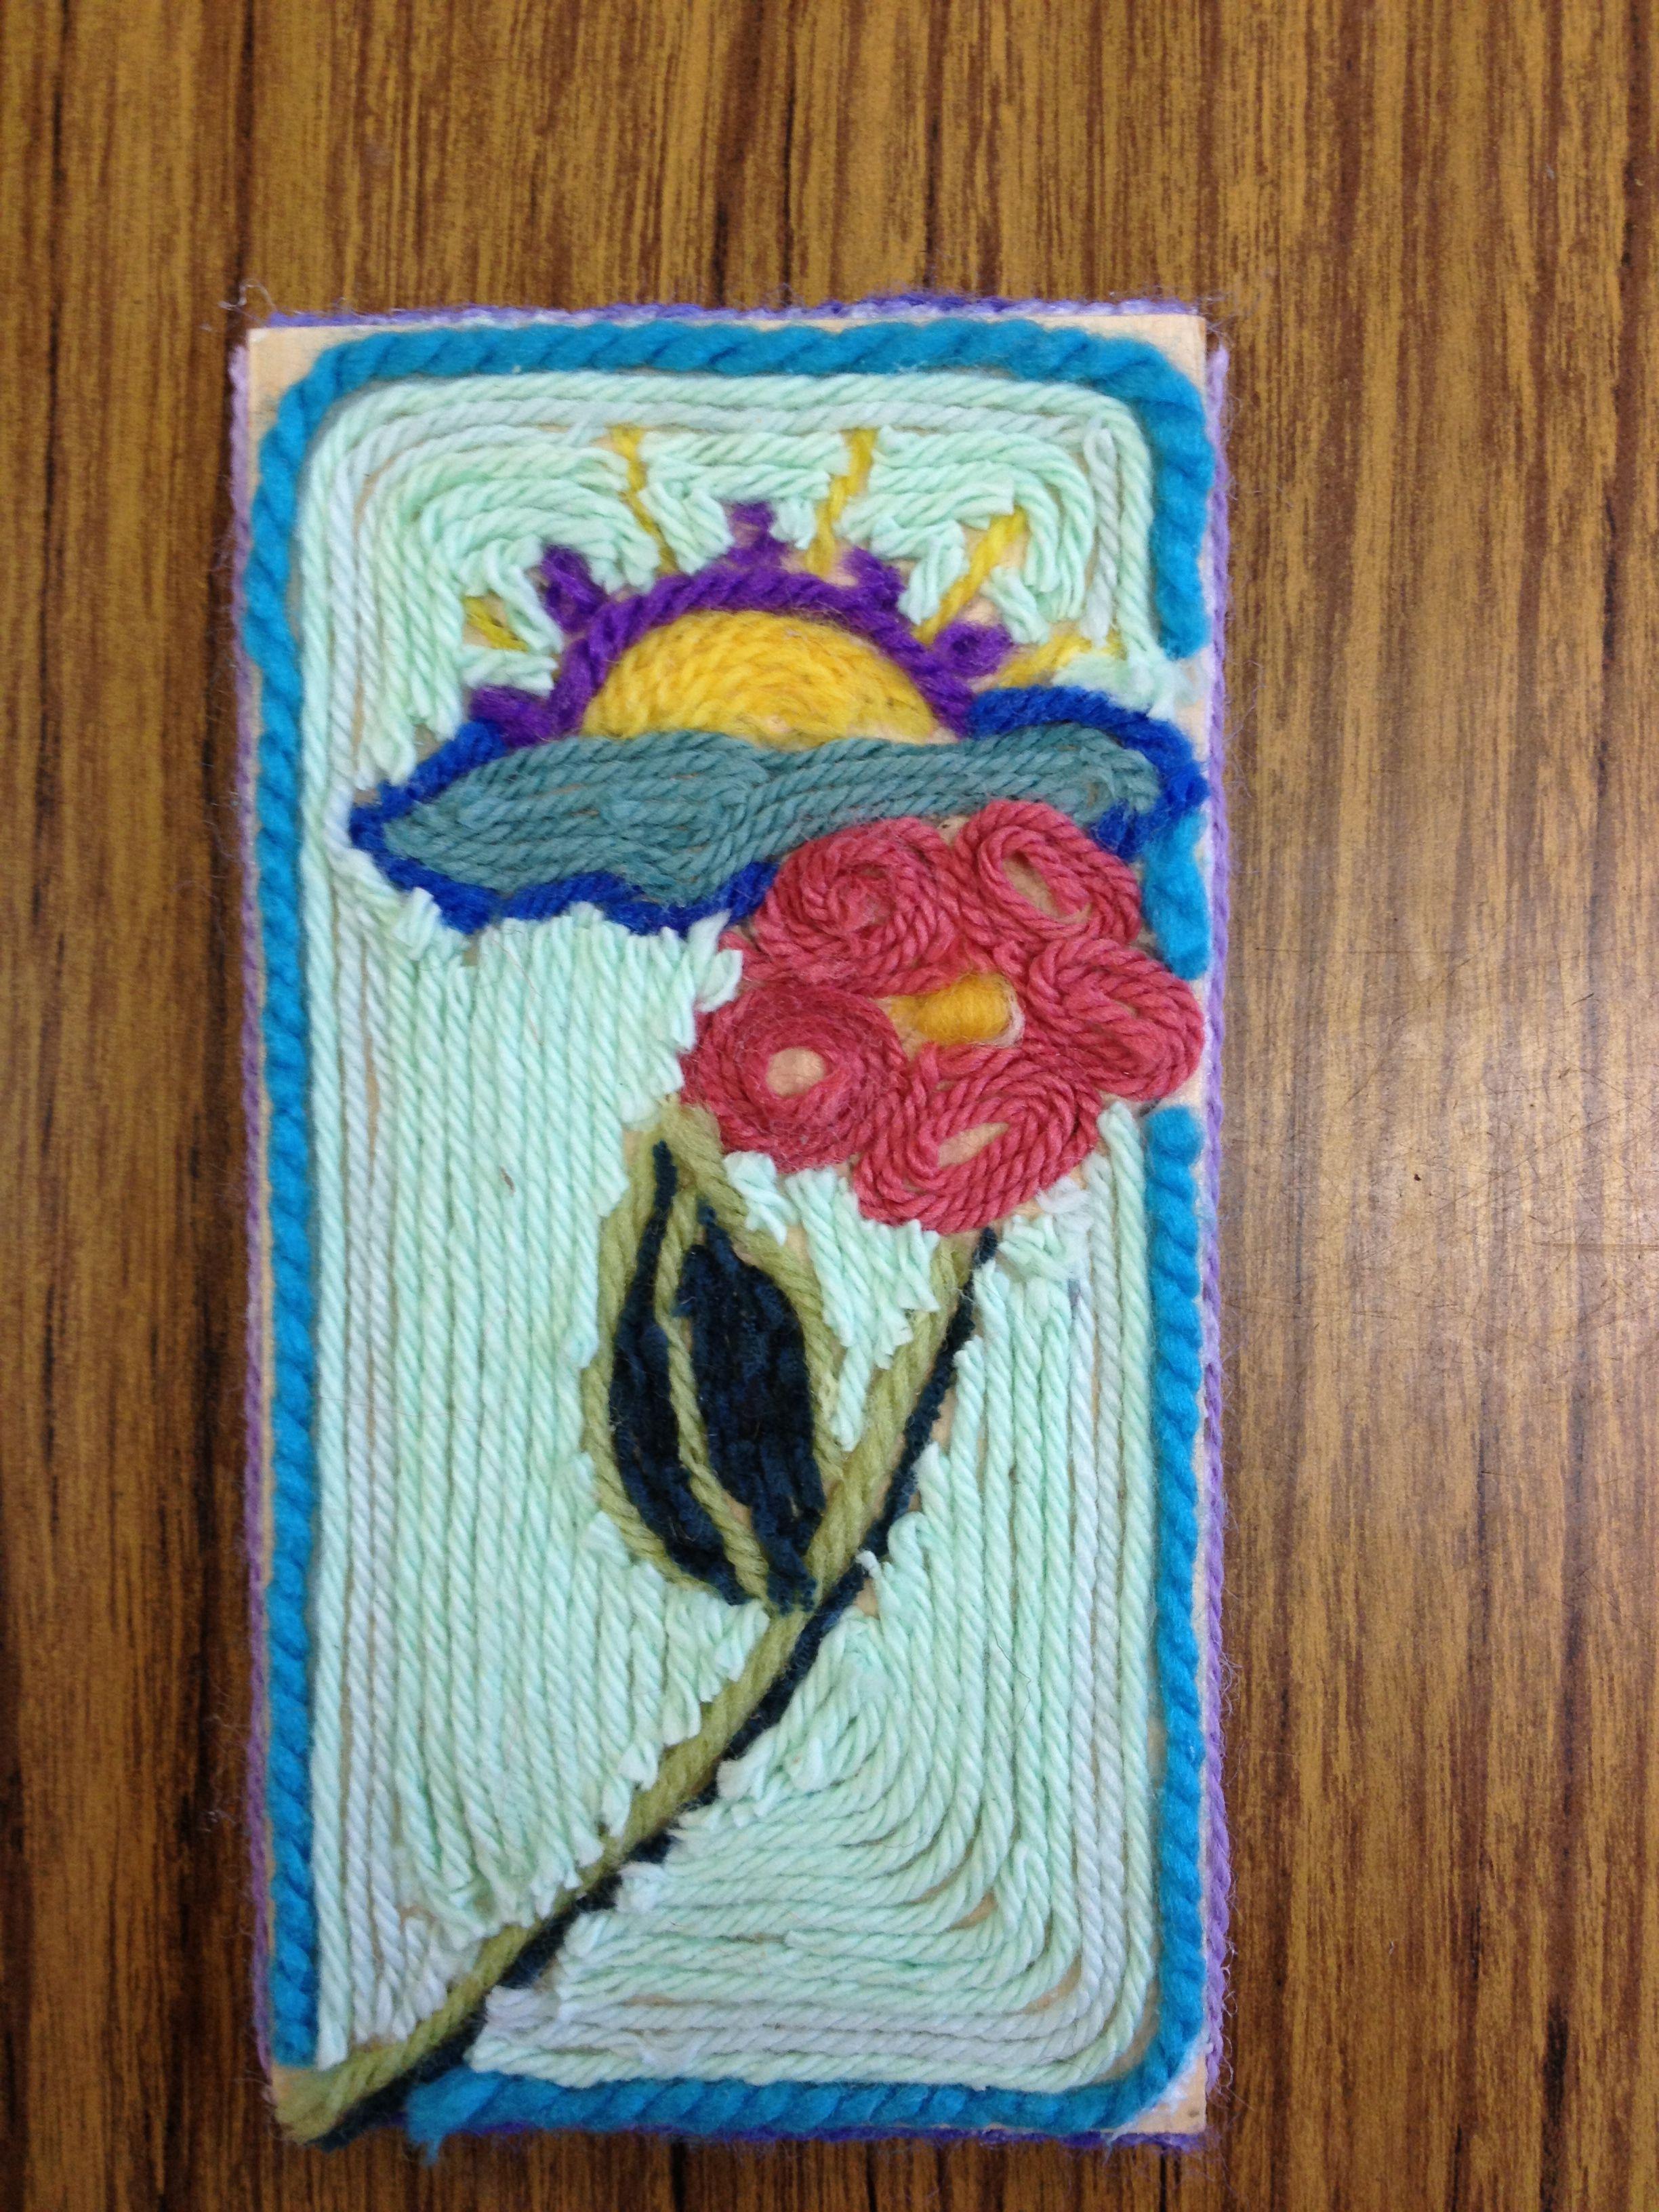 Yarn Painting 4th Grade Art Project School Art Ideas